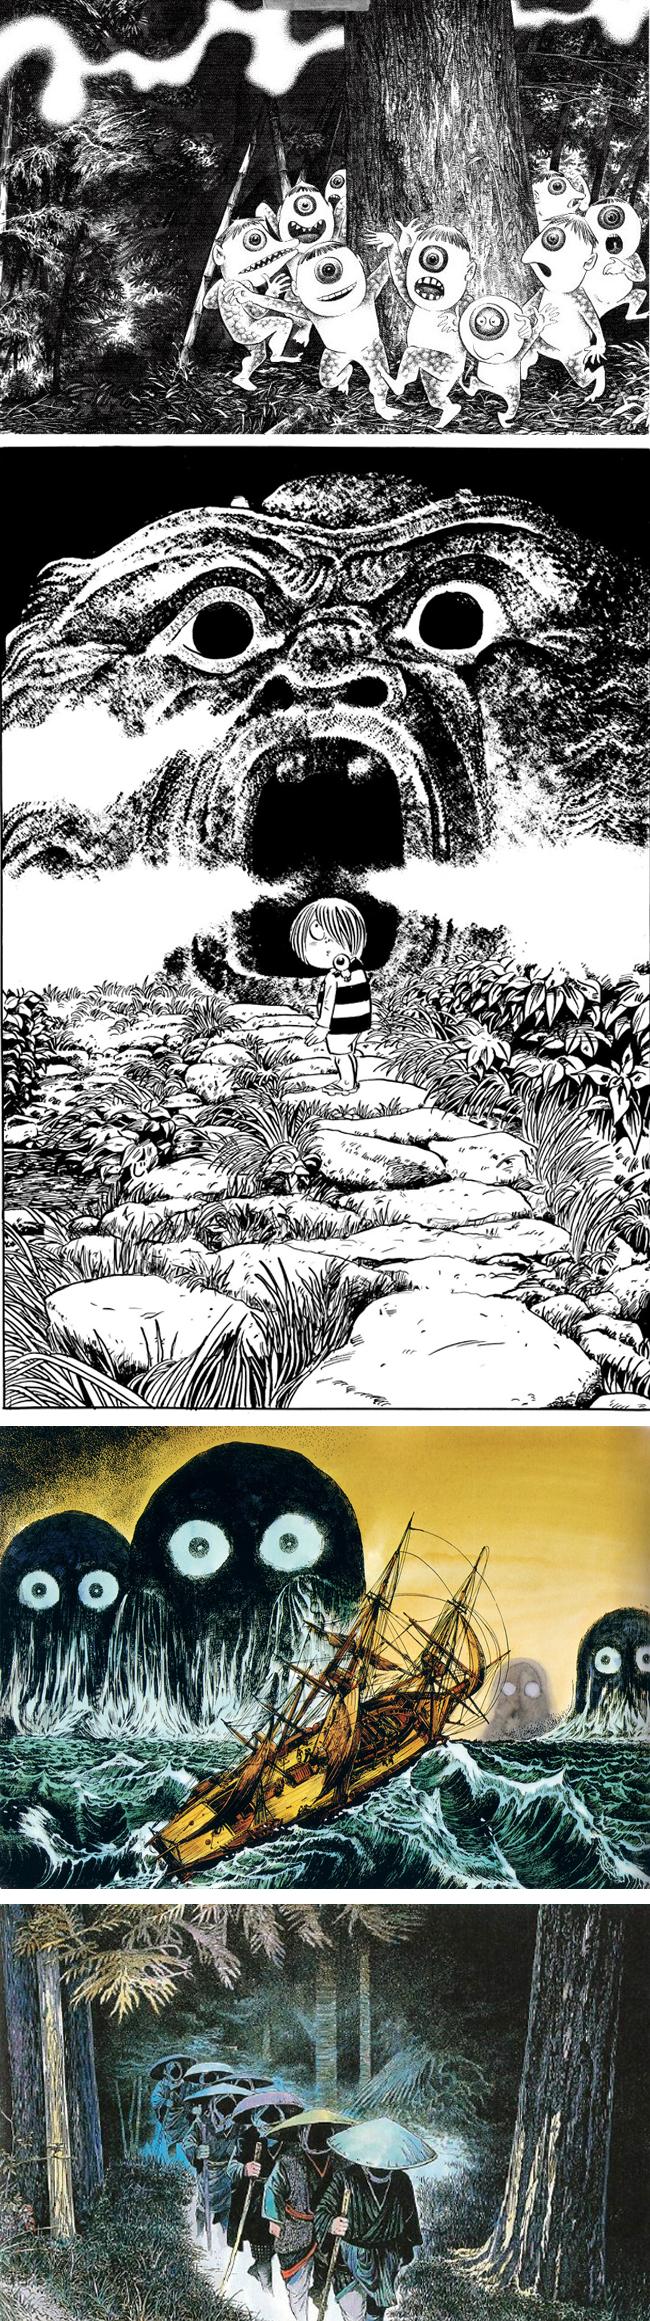 cursos_dibujo_ilustracion_manga_mikuki_academiac10_articulos_noticias_madrid